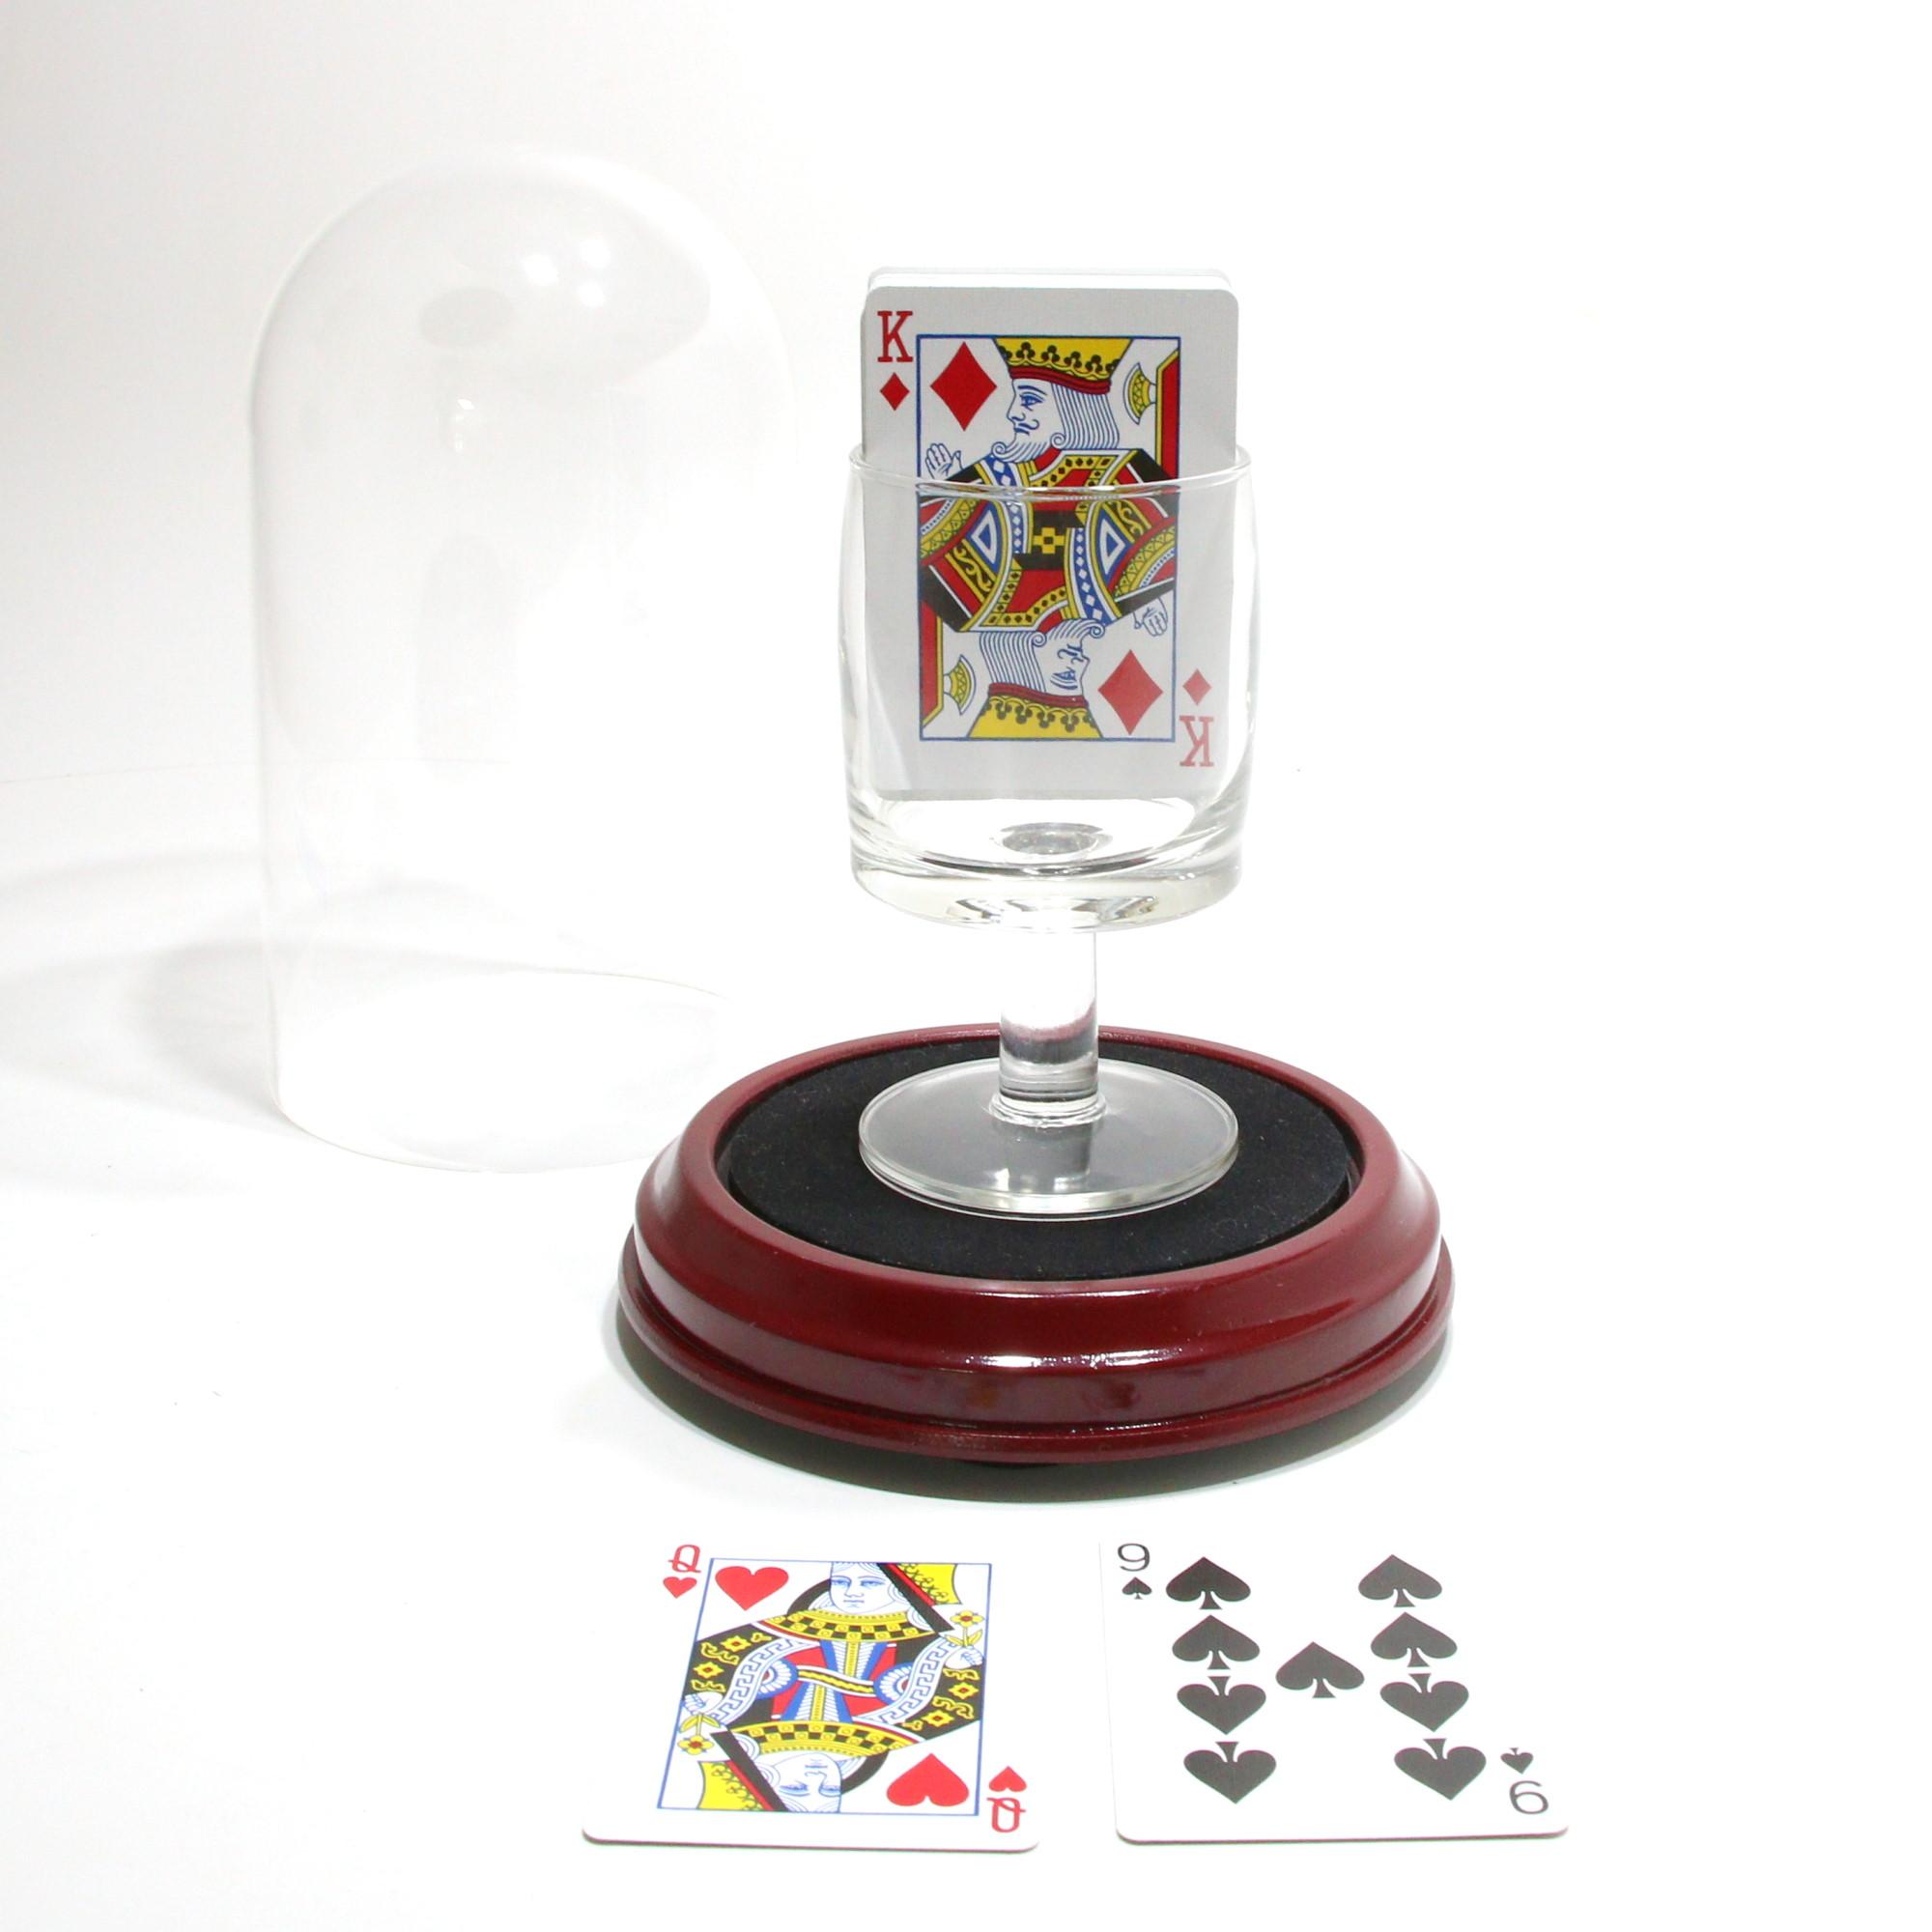 Card Transformer (Horizontal Card Rise, Gedanken Transformer) by Tony Lackner, Eckhard Boettcher